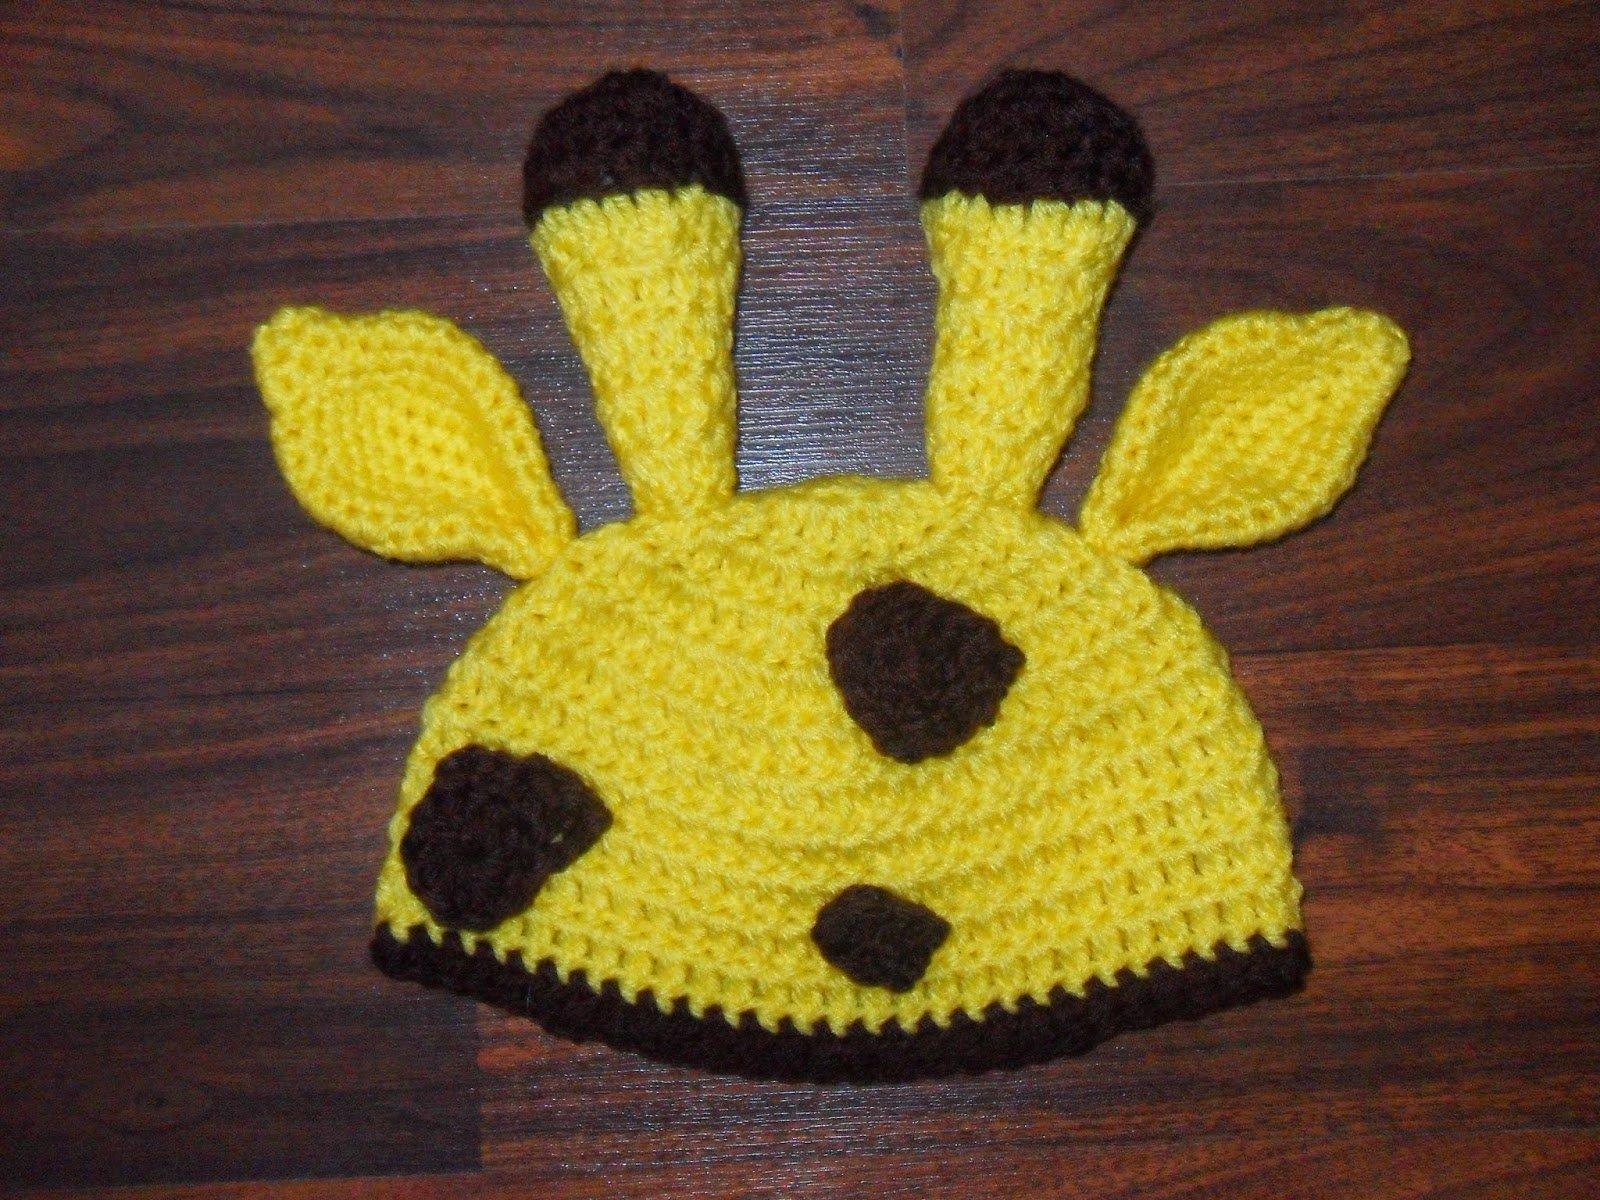 Cozy Giraffe Hat by Manda Proell of MandaLynn's Crochet Treasures